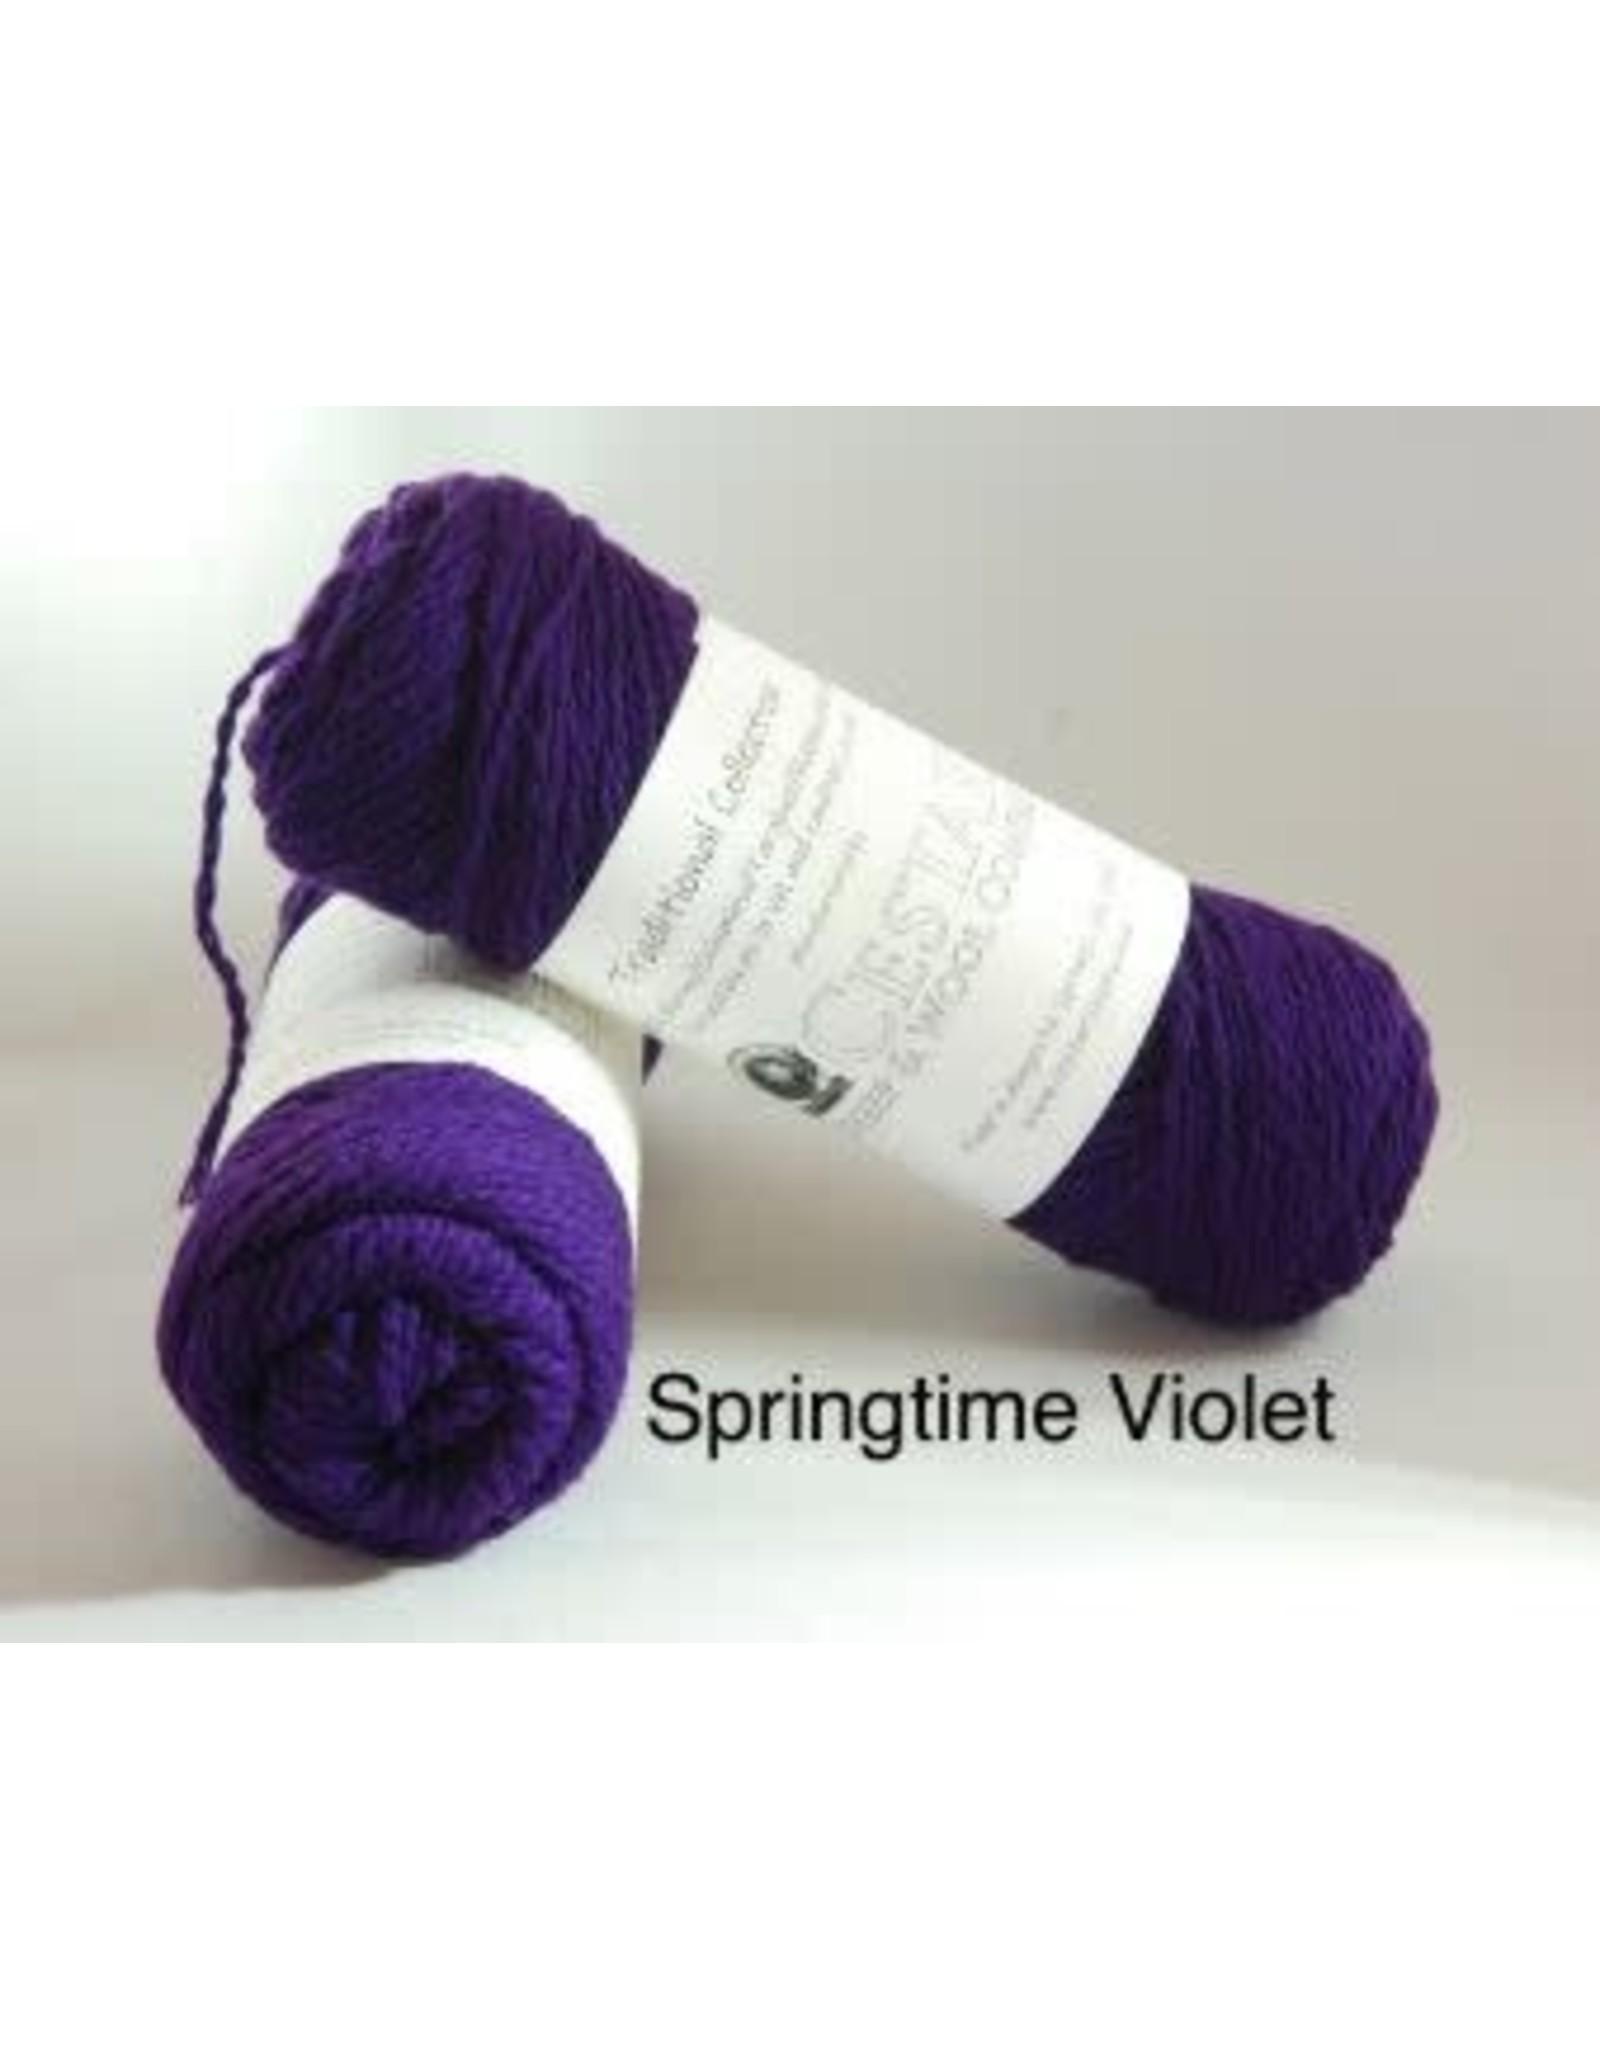 Cestari Sheep and Wool Cestari: Traditional,